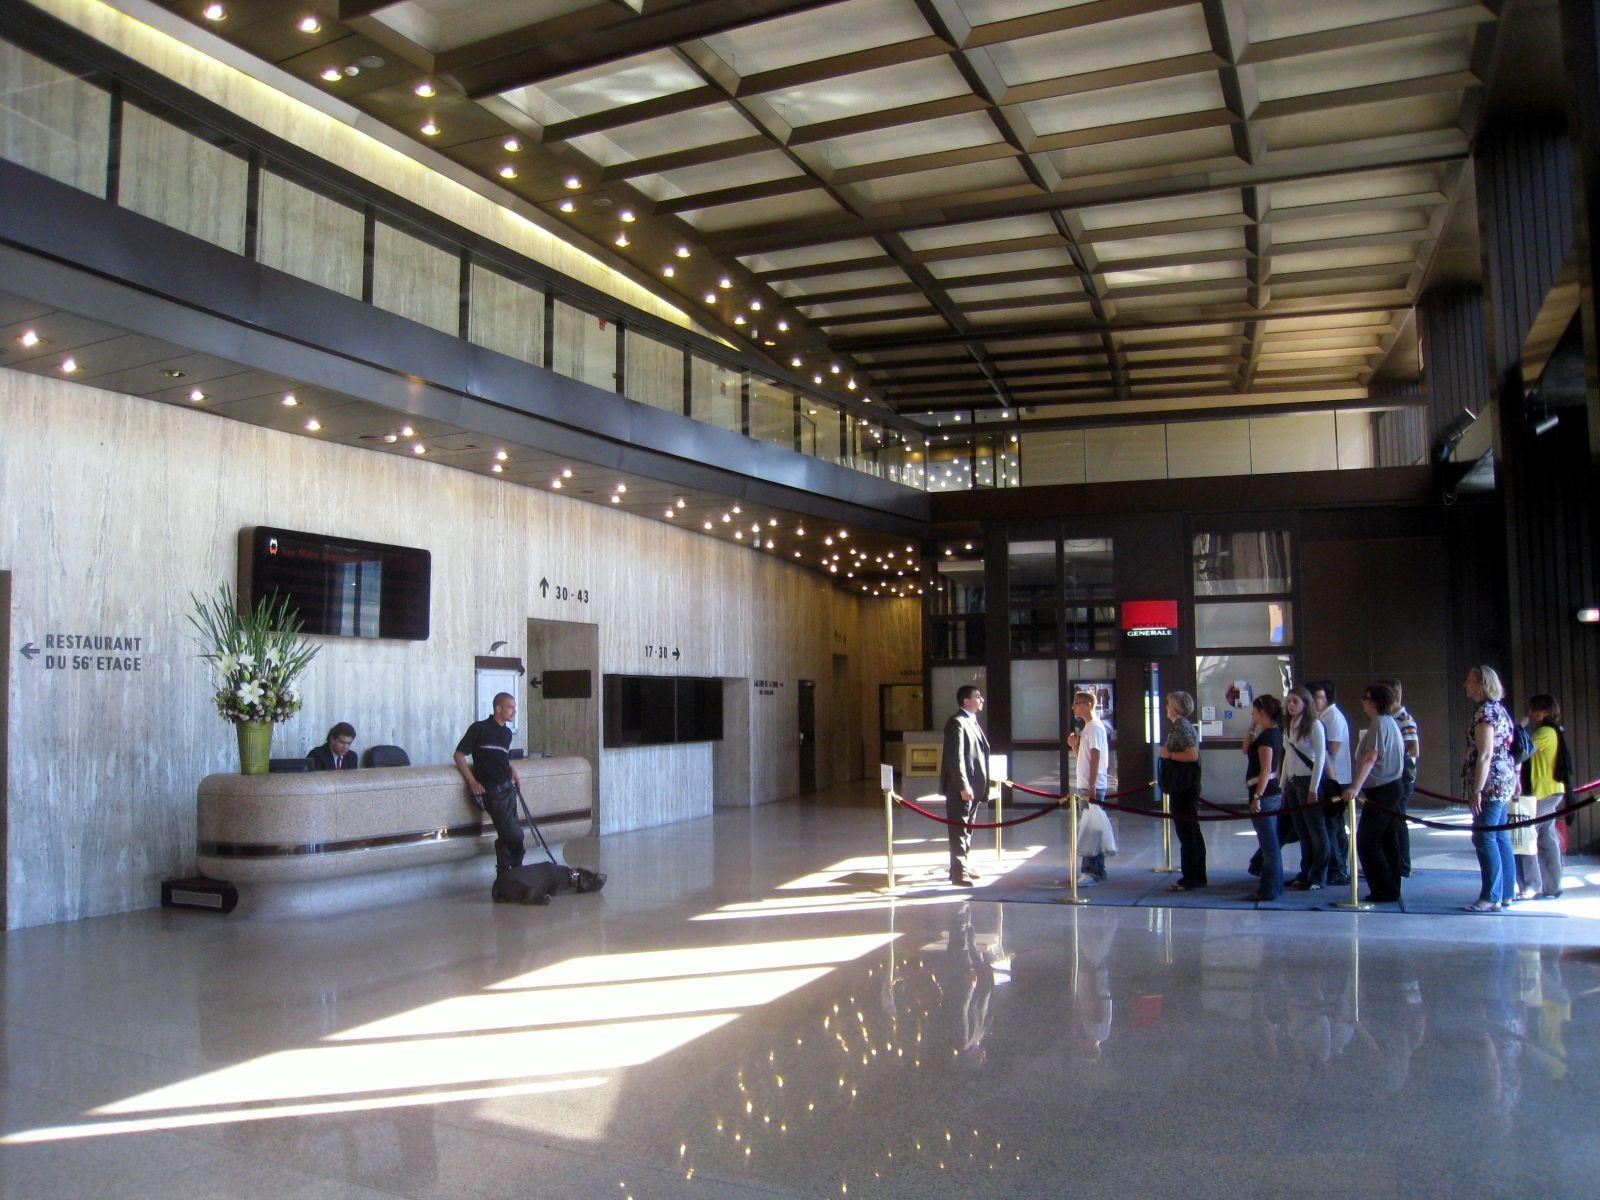 Office Lobby Interior Meyer Design Inc - Office lobby florida living pinterest lobbies and florida living